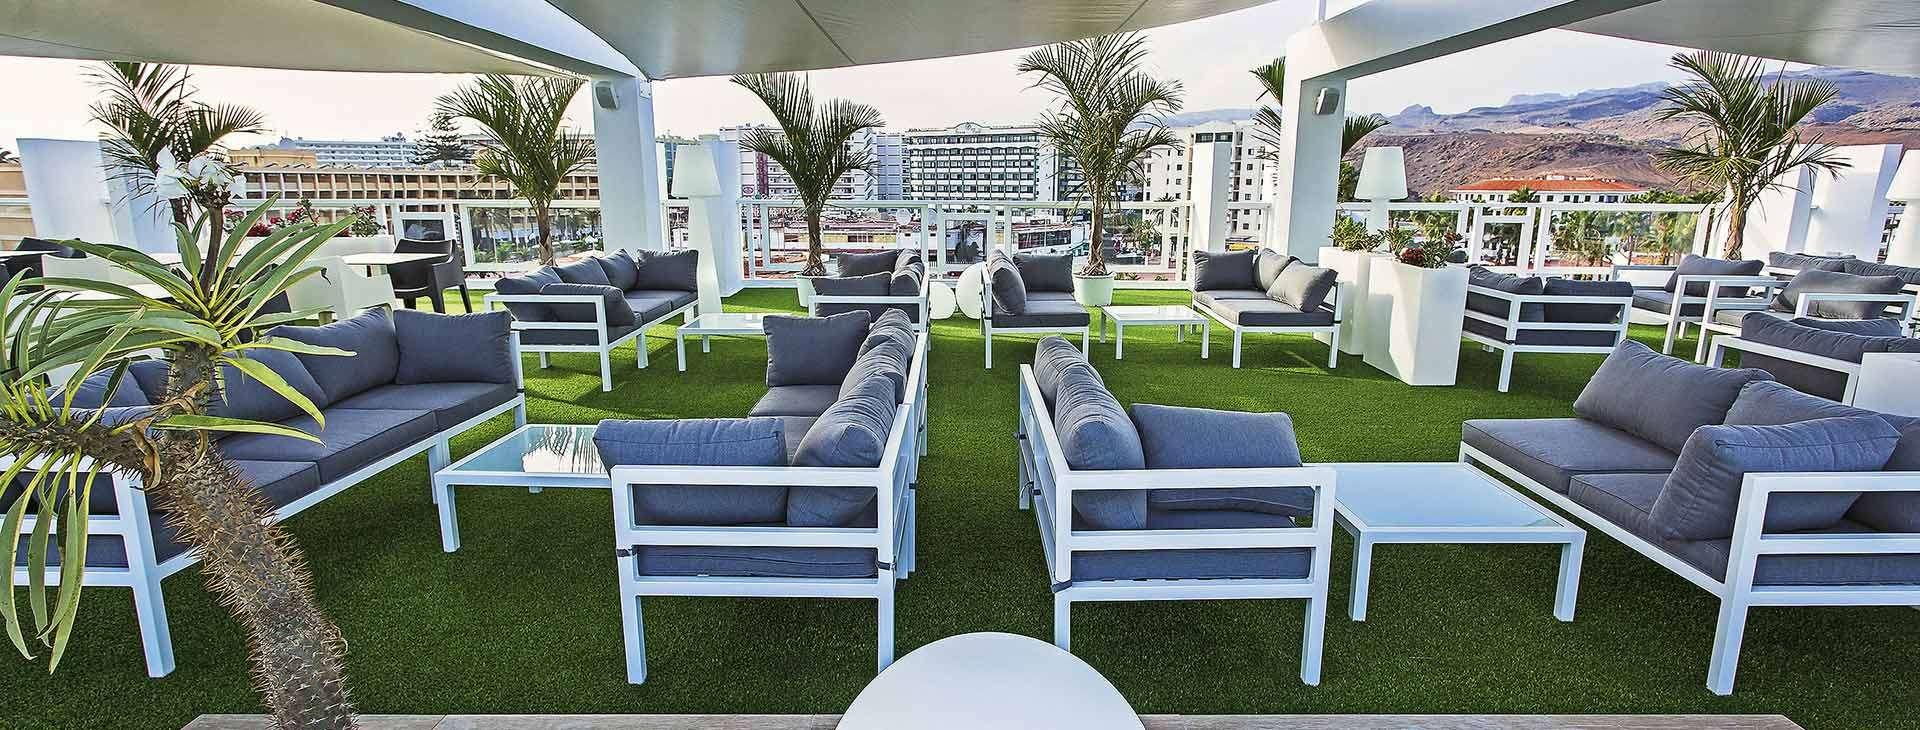 Labranda Hotel Gran Canaria Tripadvisor